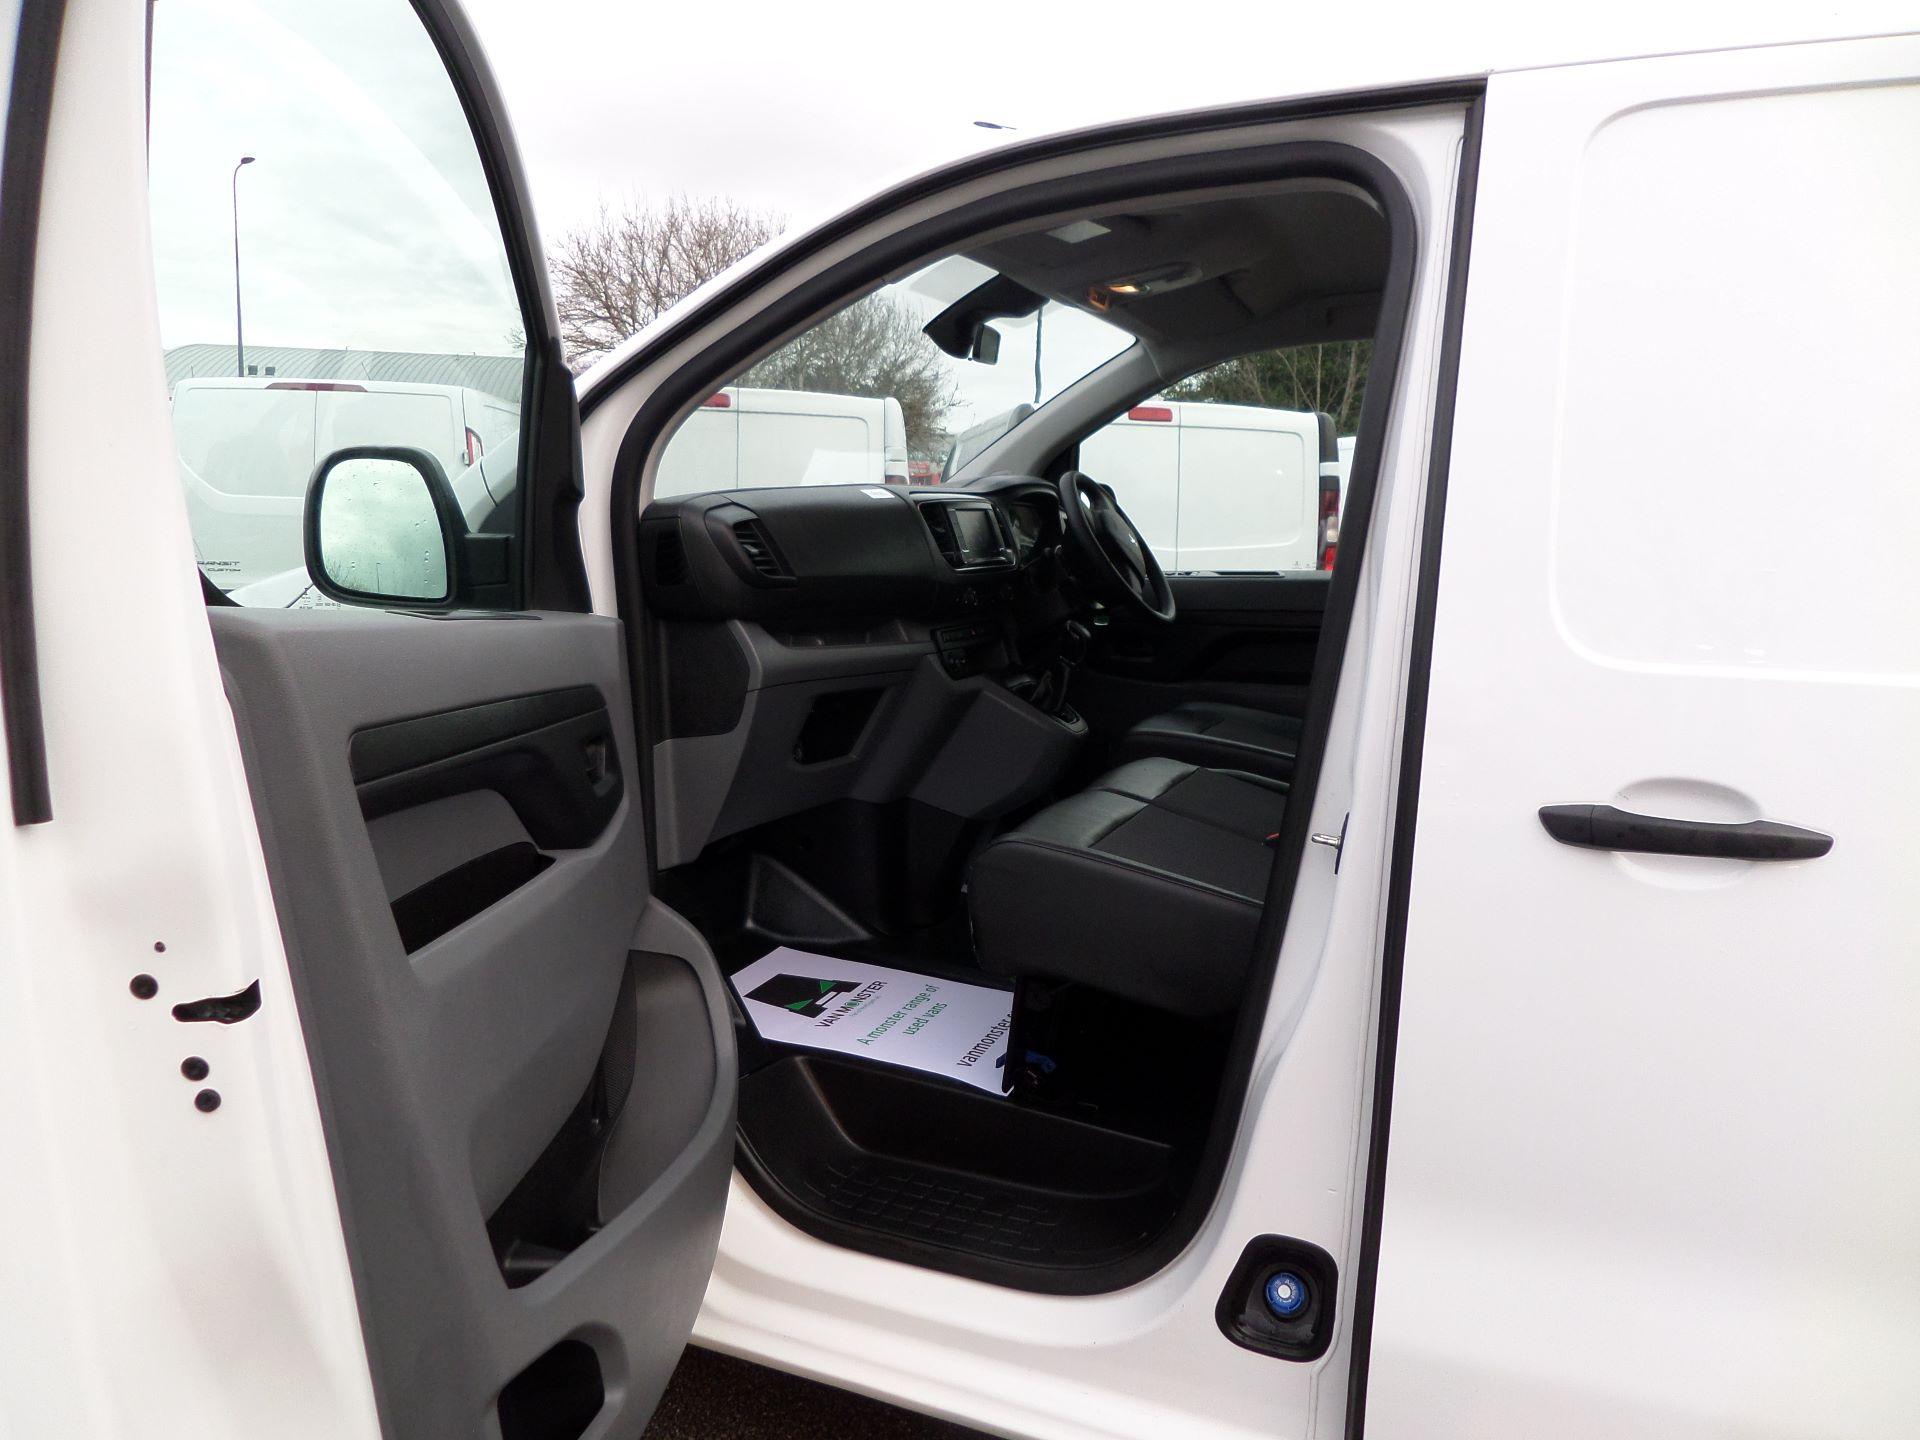 2018 Peugeot Expert 1000 1.6 Bluehdi 95 Professional Van Euro 6 (NU68BFX) Image 9